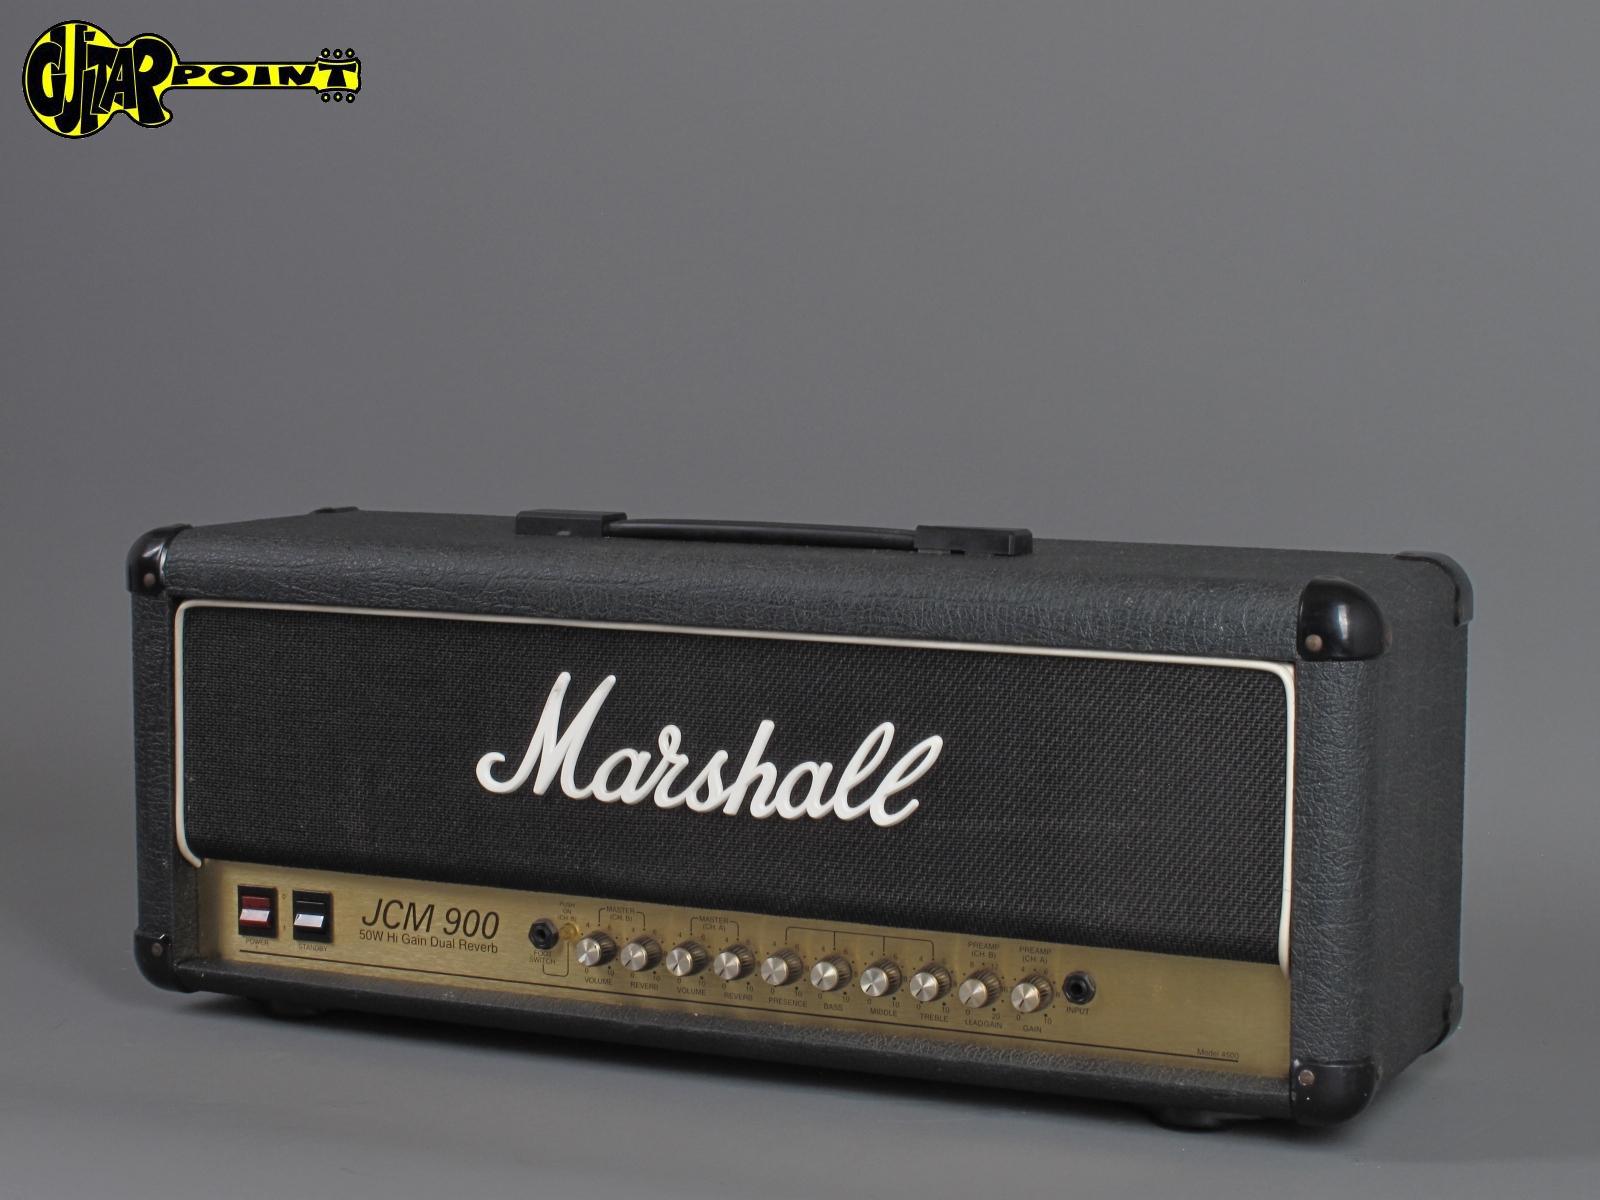 https://guitarpoint.de/app/uploads/products/1991-marshall-jcm900-50-watt-higain-dual-reverb-4500/Marshall91JCM9004500Z19540_21.jpg